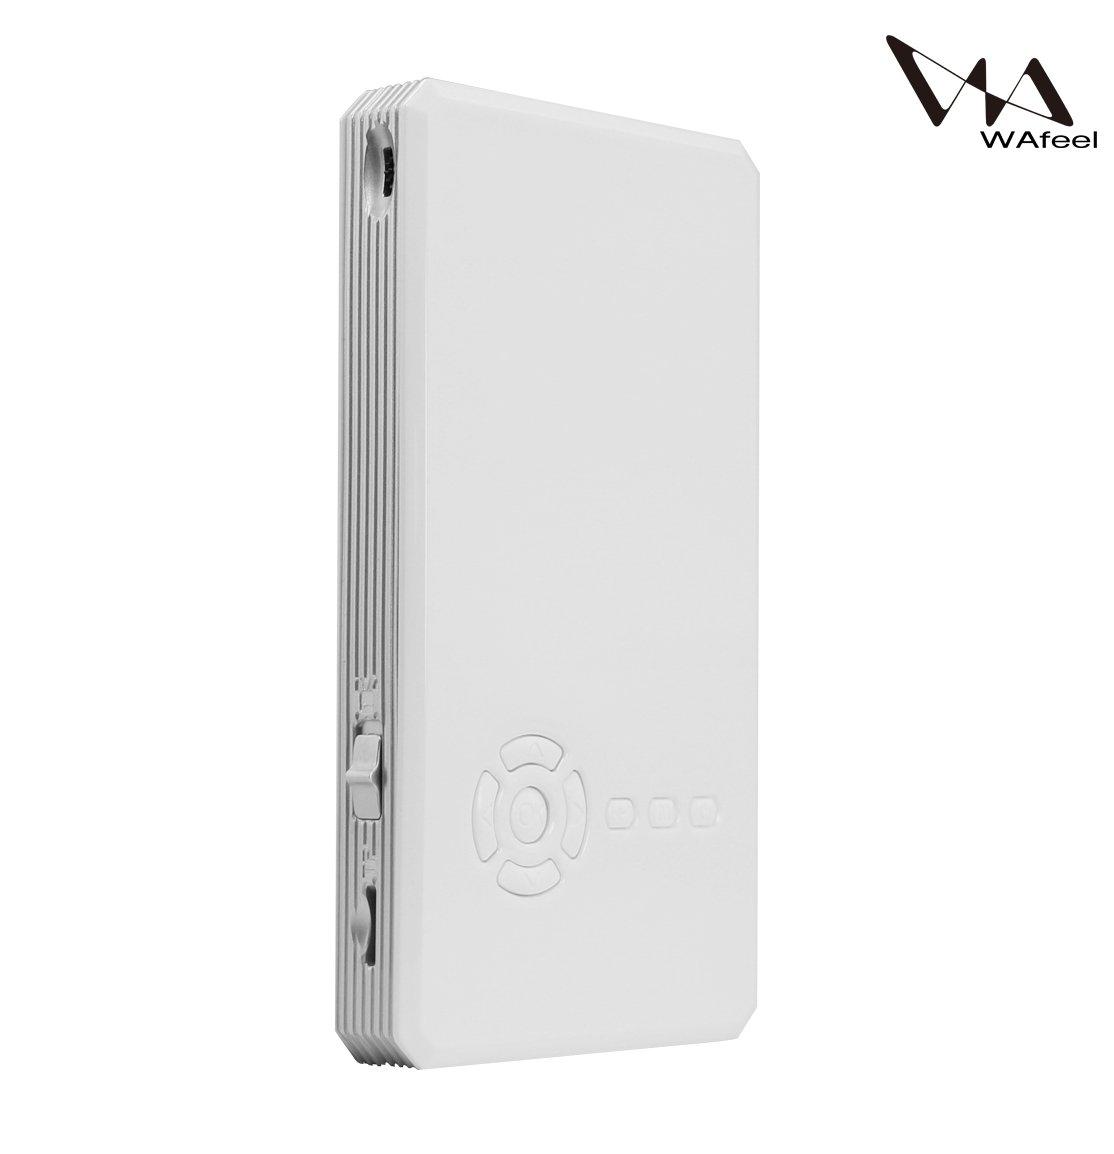 【WAfeel】多機種対応 プロジェクター T9 ミニサイズ DLPテクノロジー採用 全2色 Android 4.4OS搭載 Bluetooth4.0機能付き WI-FI無線対応 携帯式 三脚式スタンド付き (8GB, ホワイト) B01NAC3PS9 ホワイト 8GB